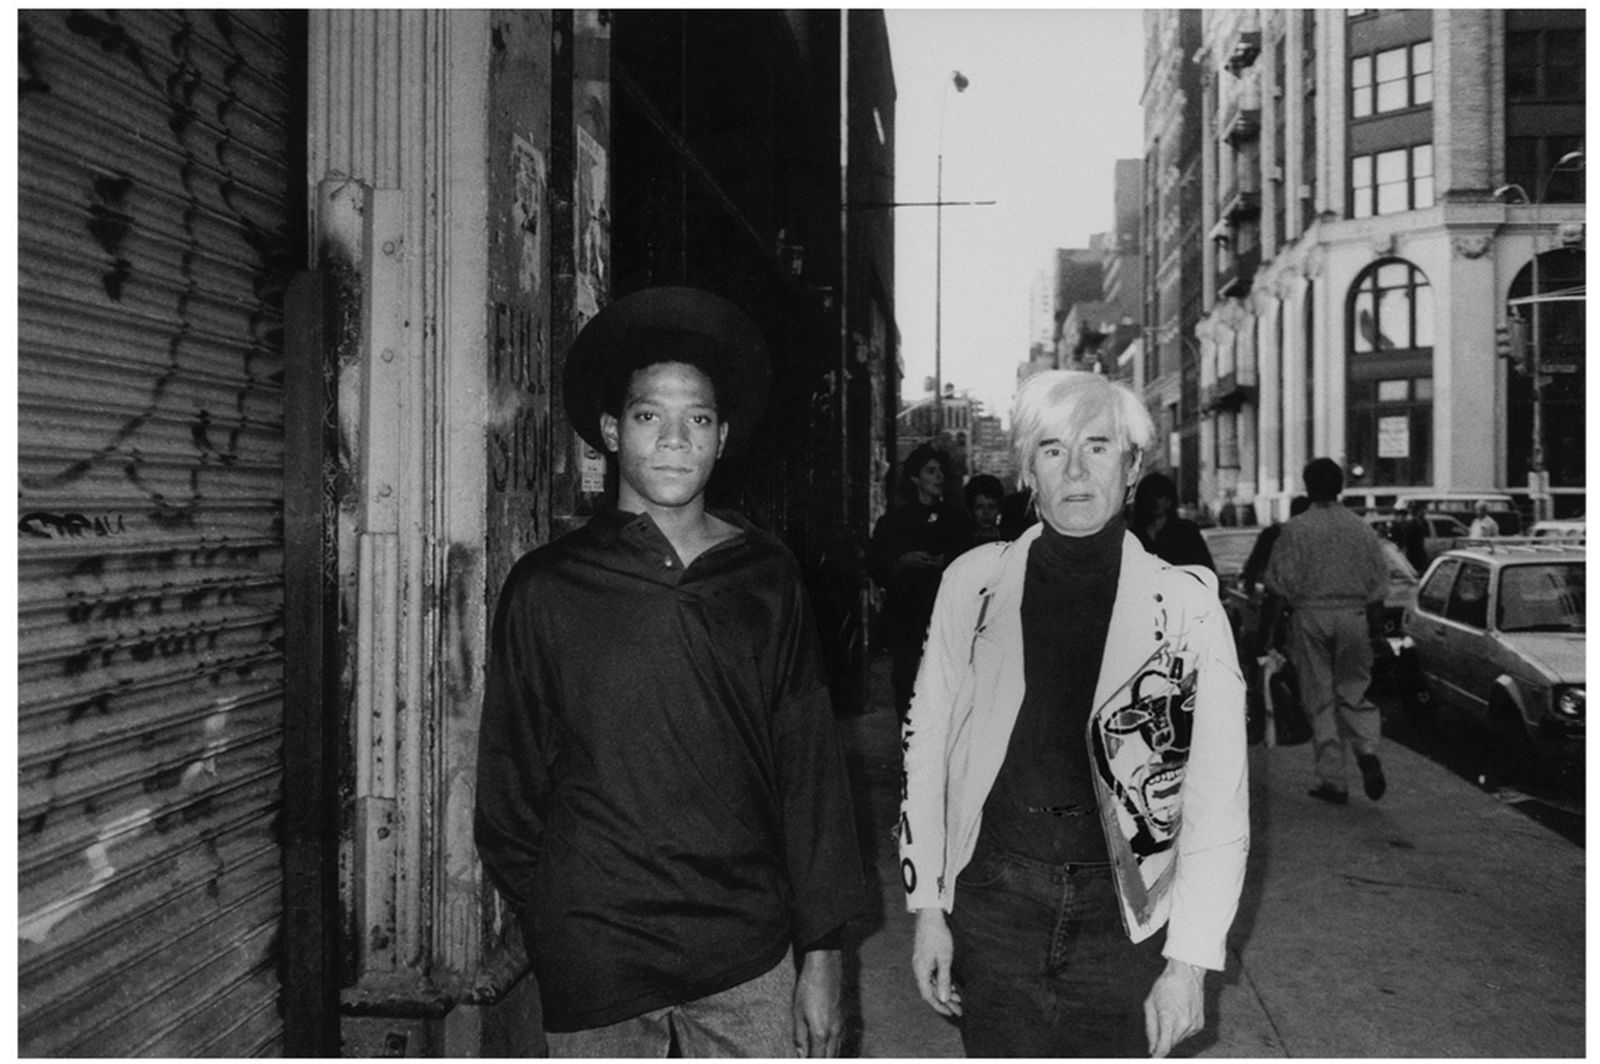 Basquiat with Warhol, Mercer St. NYC, 1985